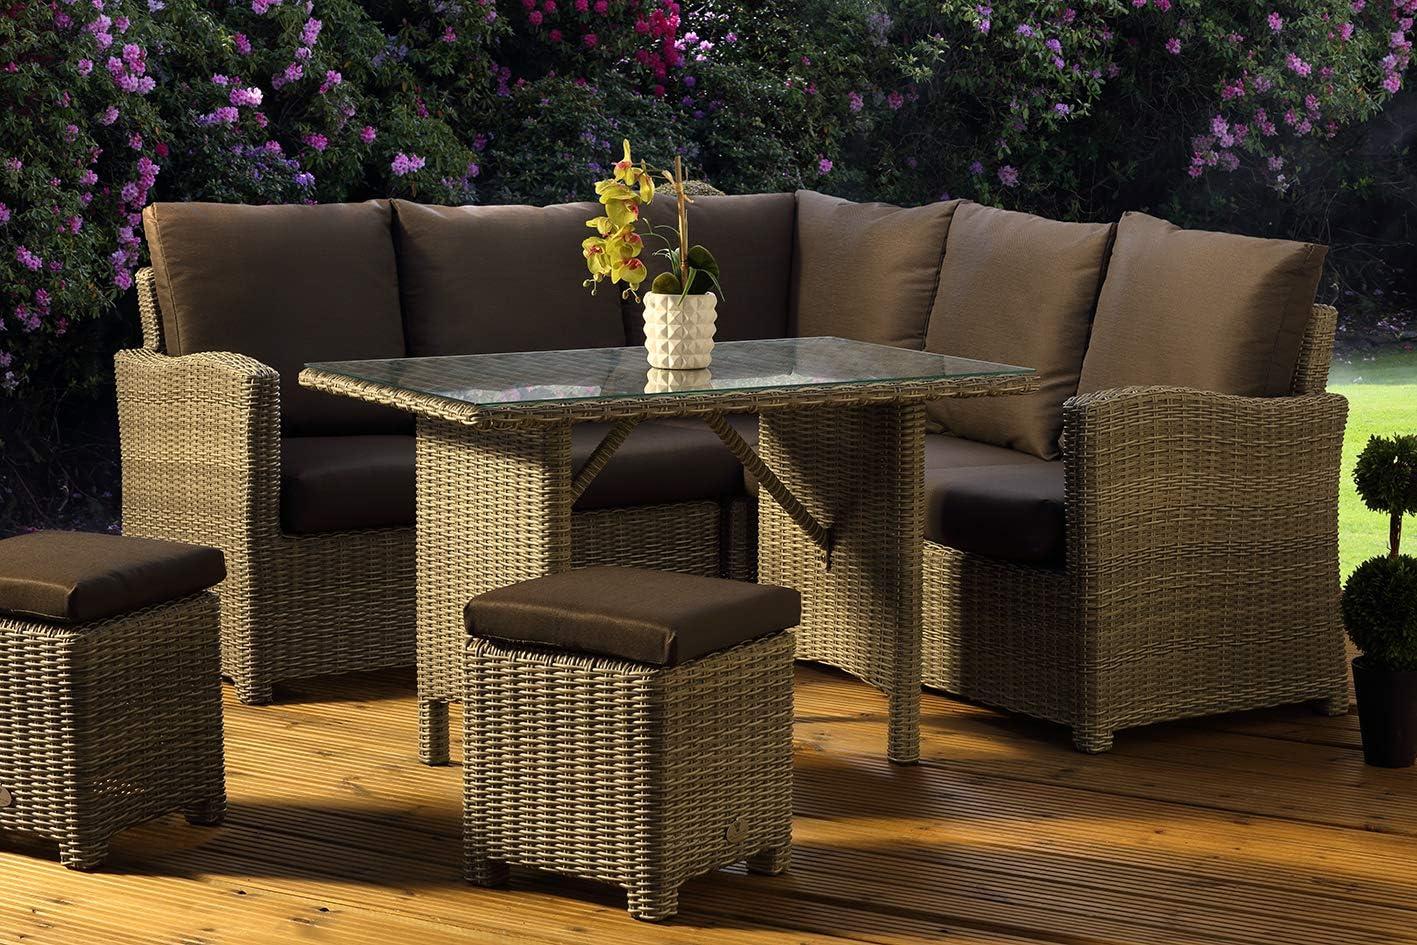 Desser Long Island Grey Luxury Rattan Outdoor Garden Patio Furniture Lounge Dining Set Wicker Corner Sofa Stool Glass Table Uk Made Cushions In Premium Dallas Fabric Amazon Co Uk Kitchen